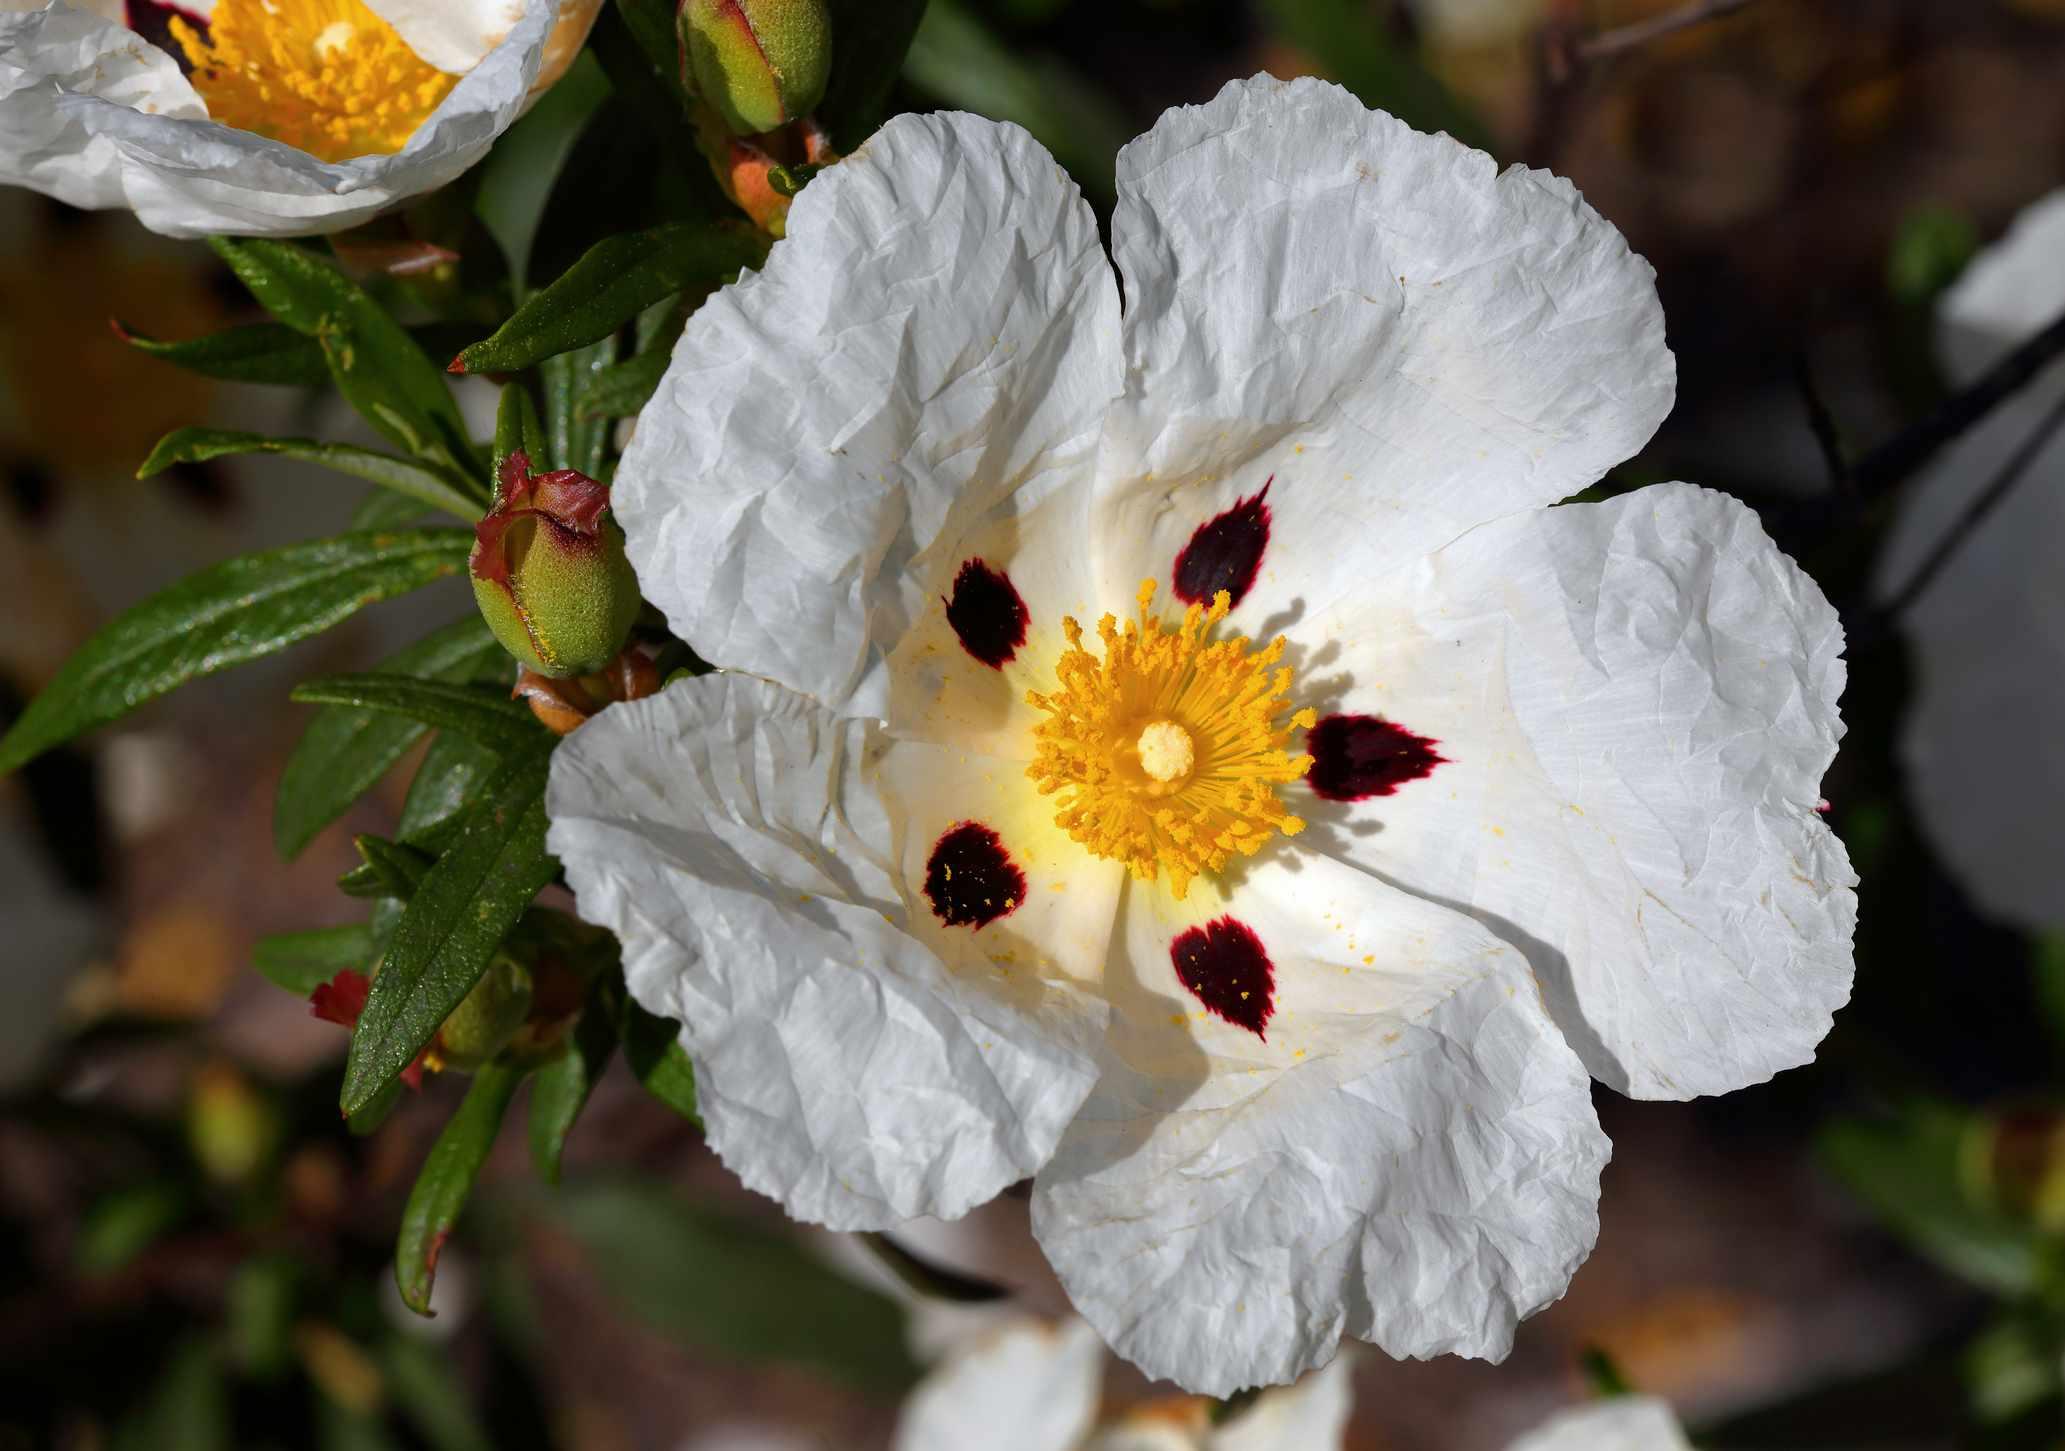 A close up photo of a white Cistus ladanifer (Crimson-Spot Rockrose) in the garden.